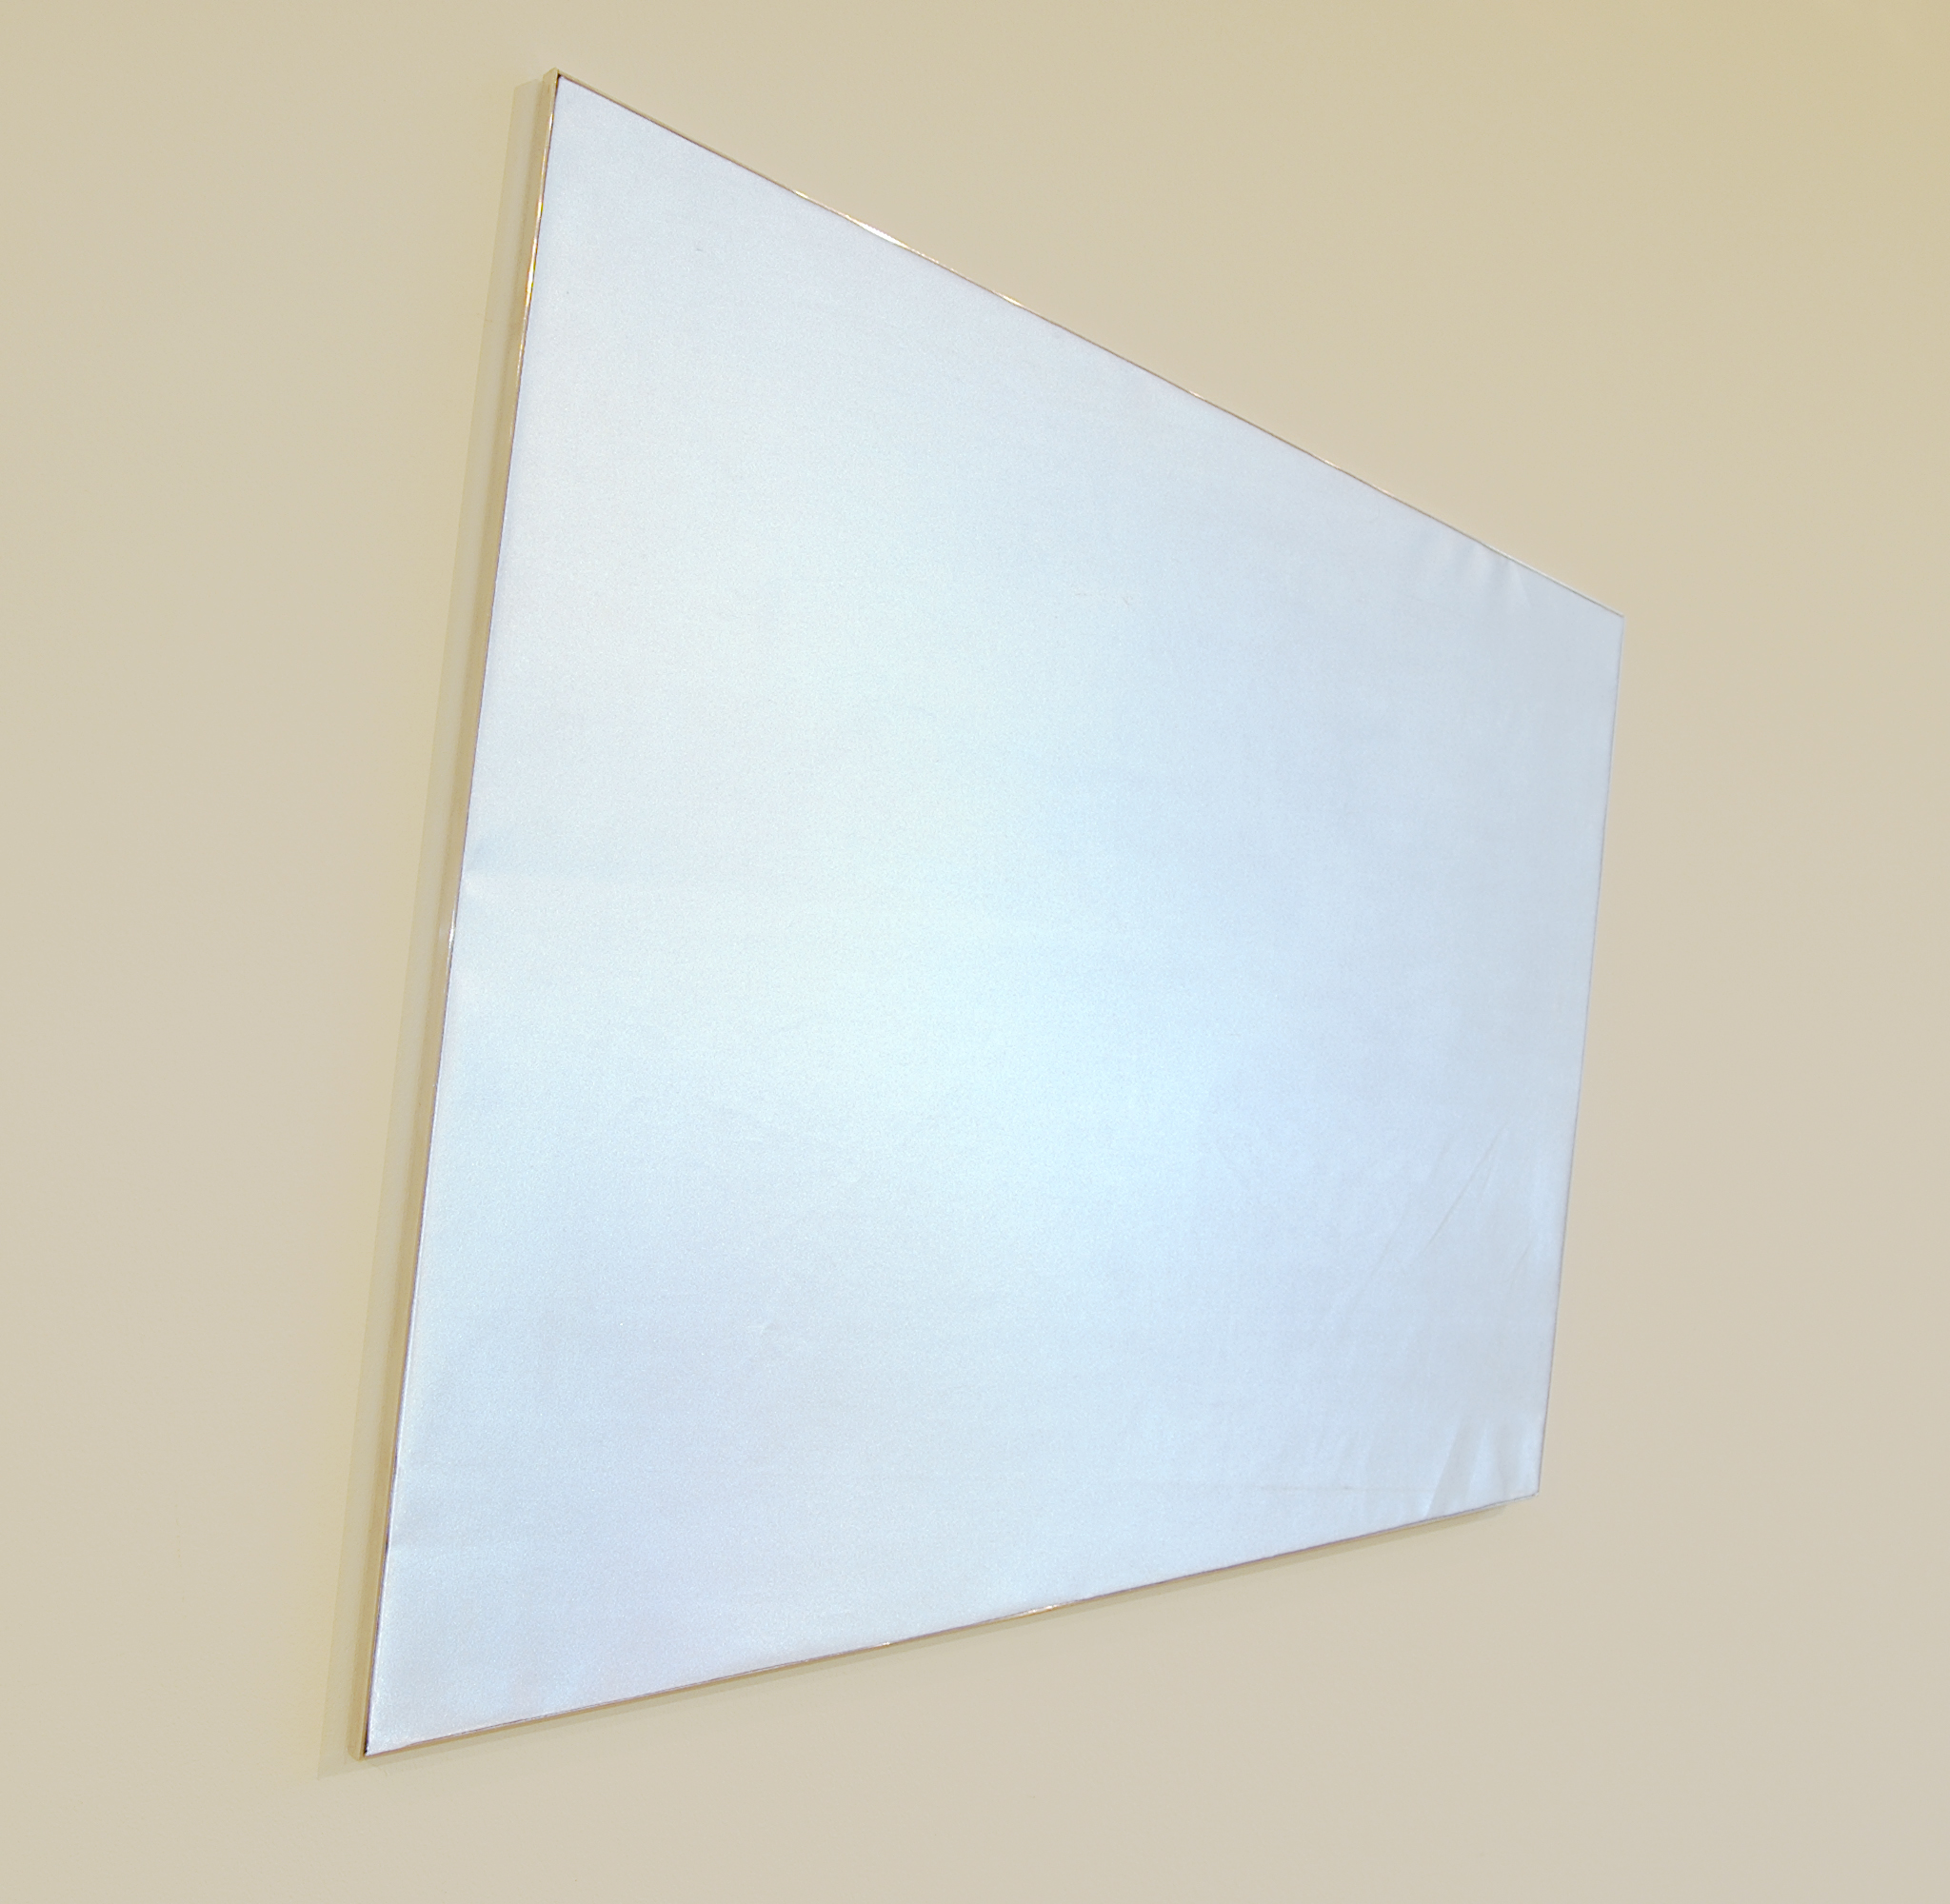 "LUCY PULLEN   Chromadynamics III , fabric and aluminum, 25"" x 24"", 2012"